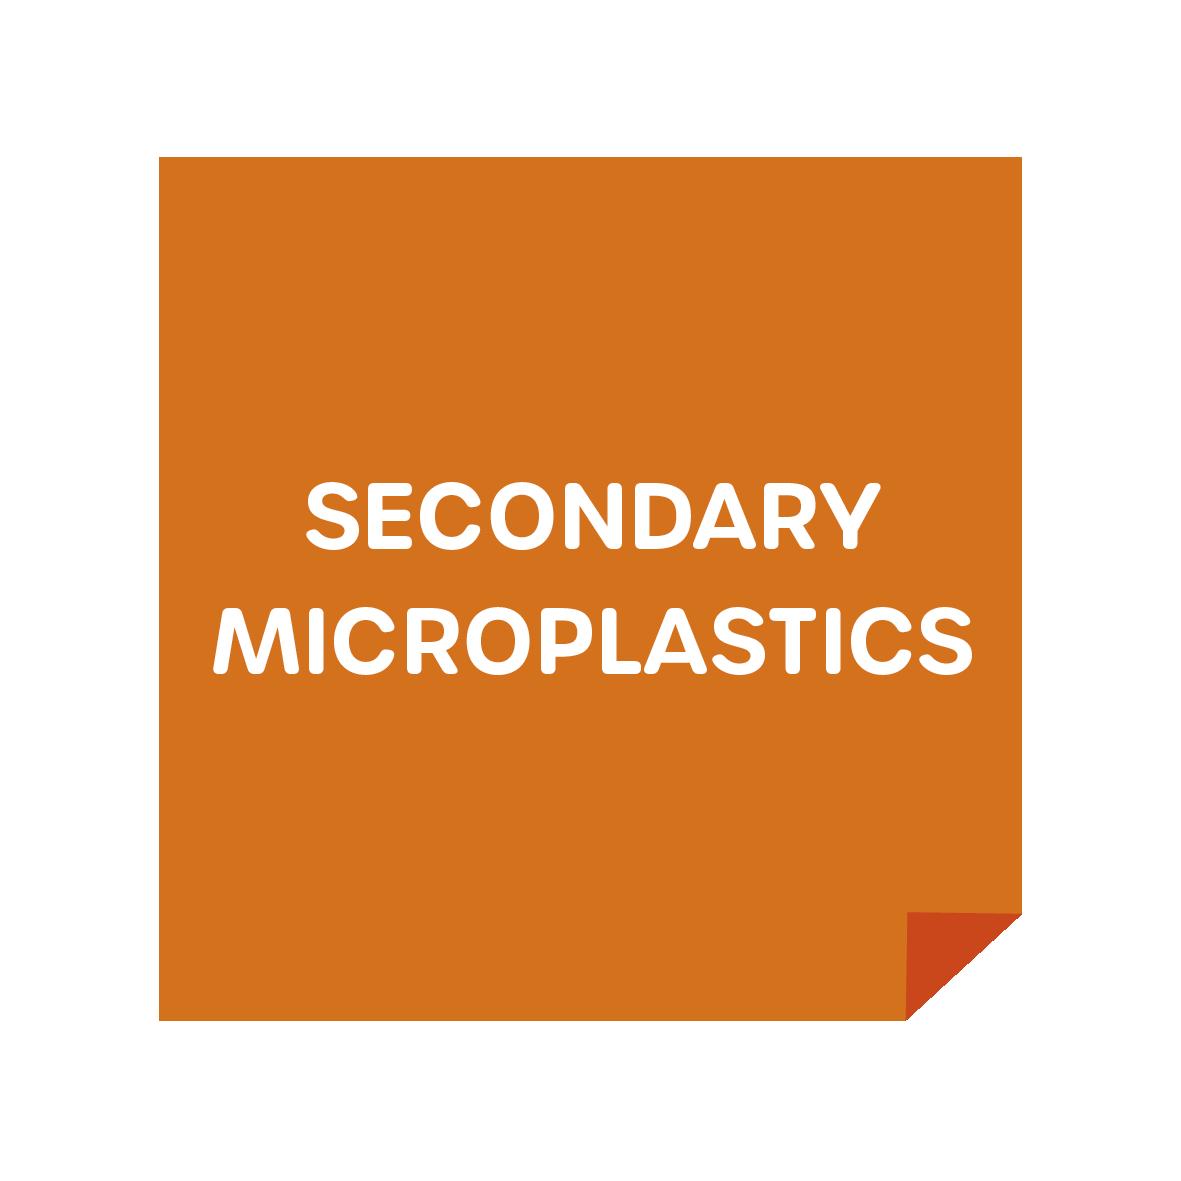 Secondary Microplastics